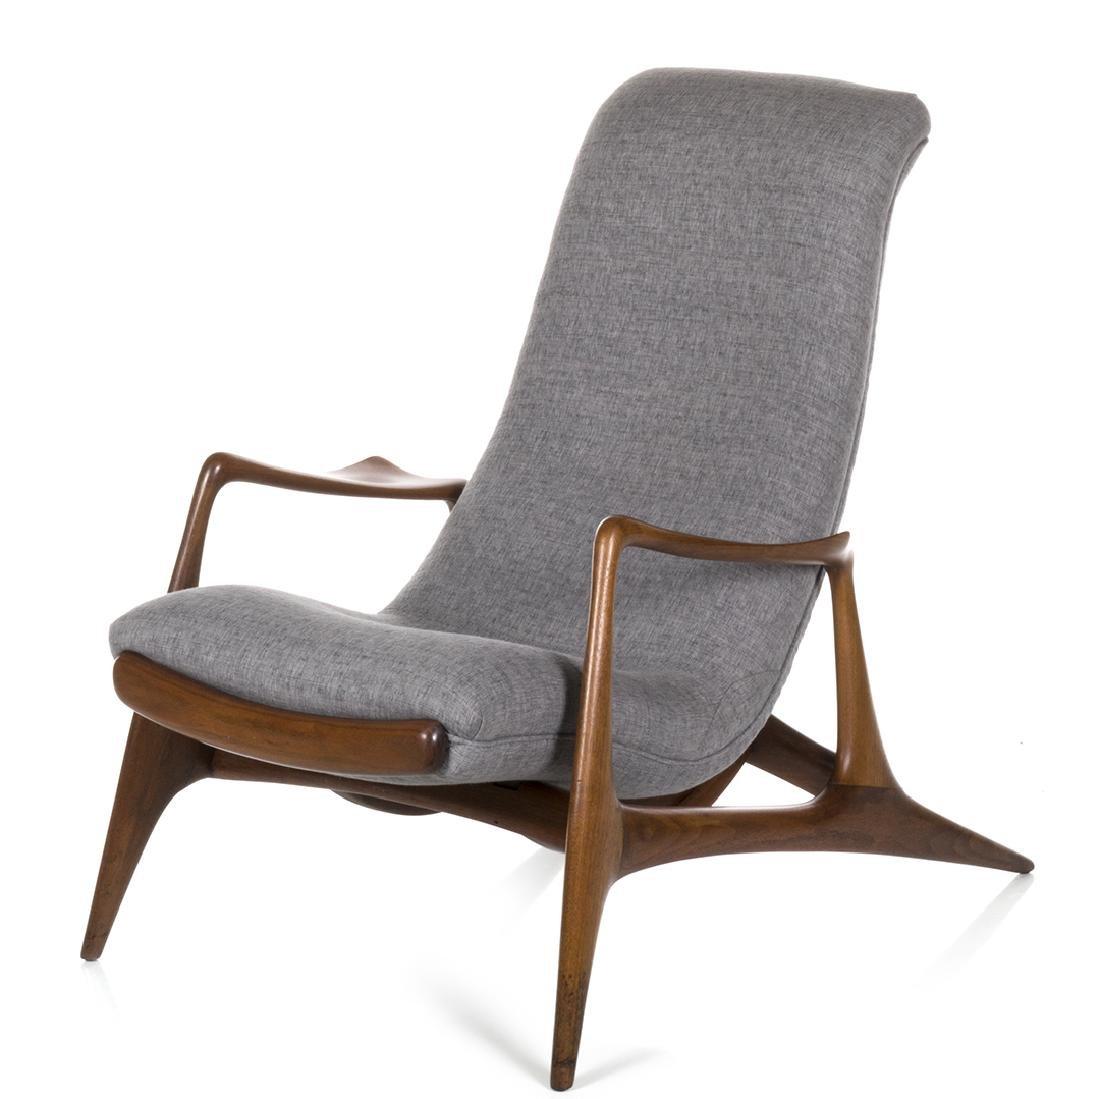 Vladimir Kagan Adjustable Lounge Chair